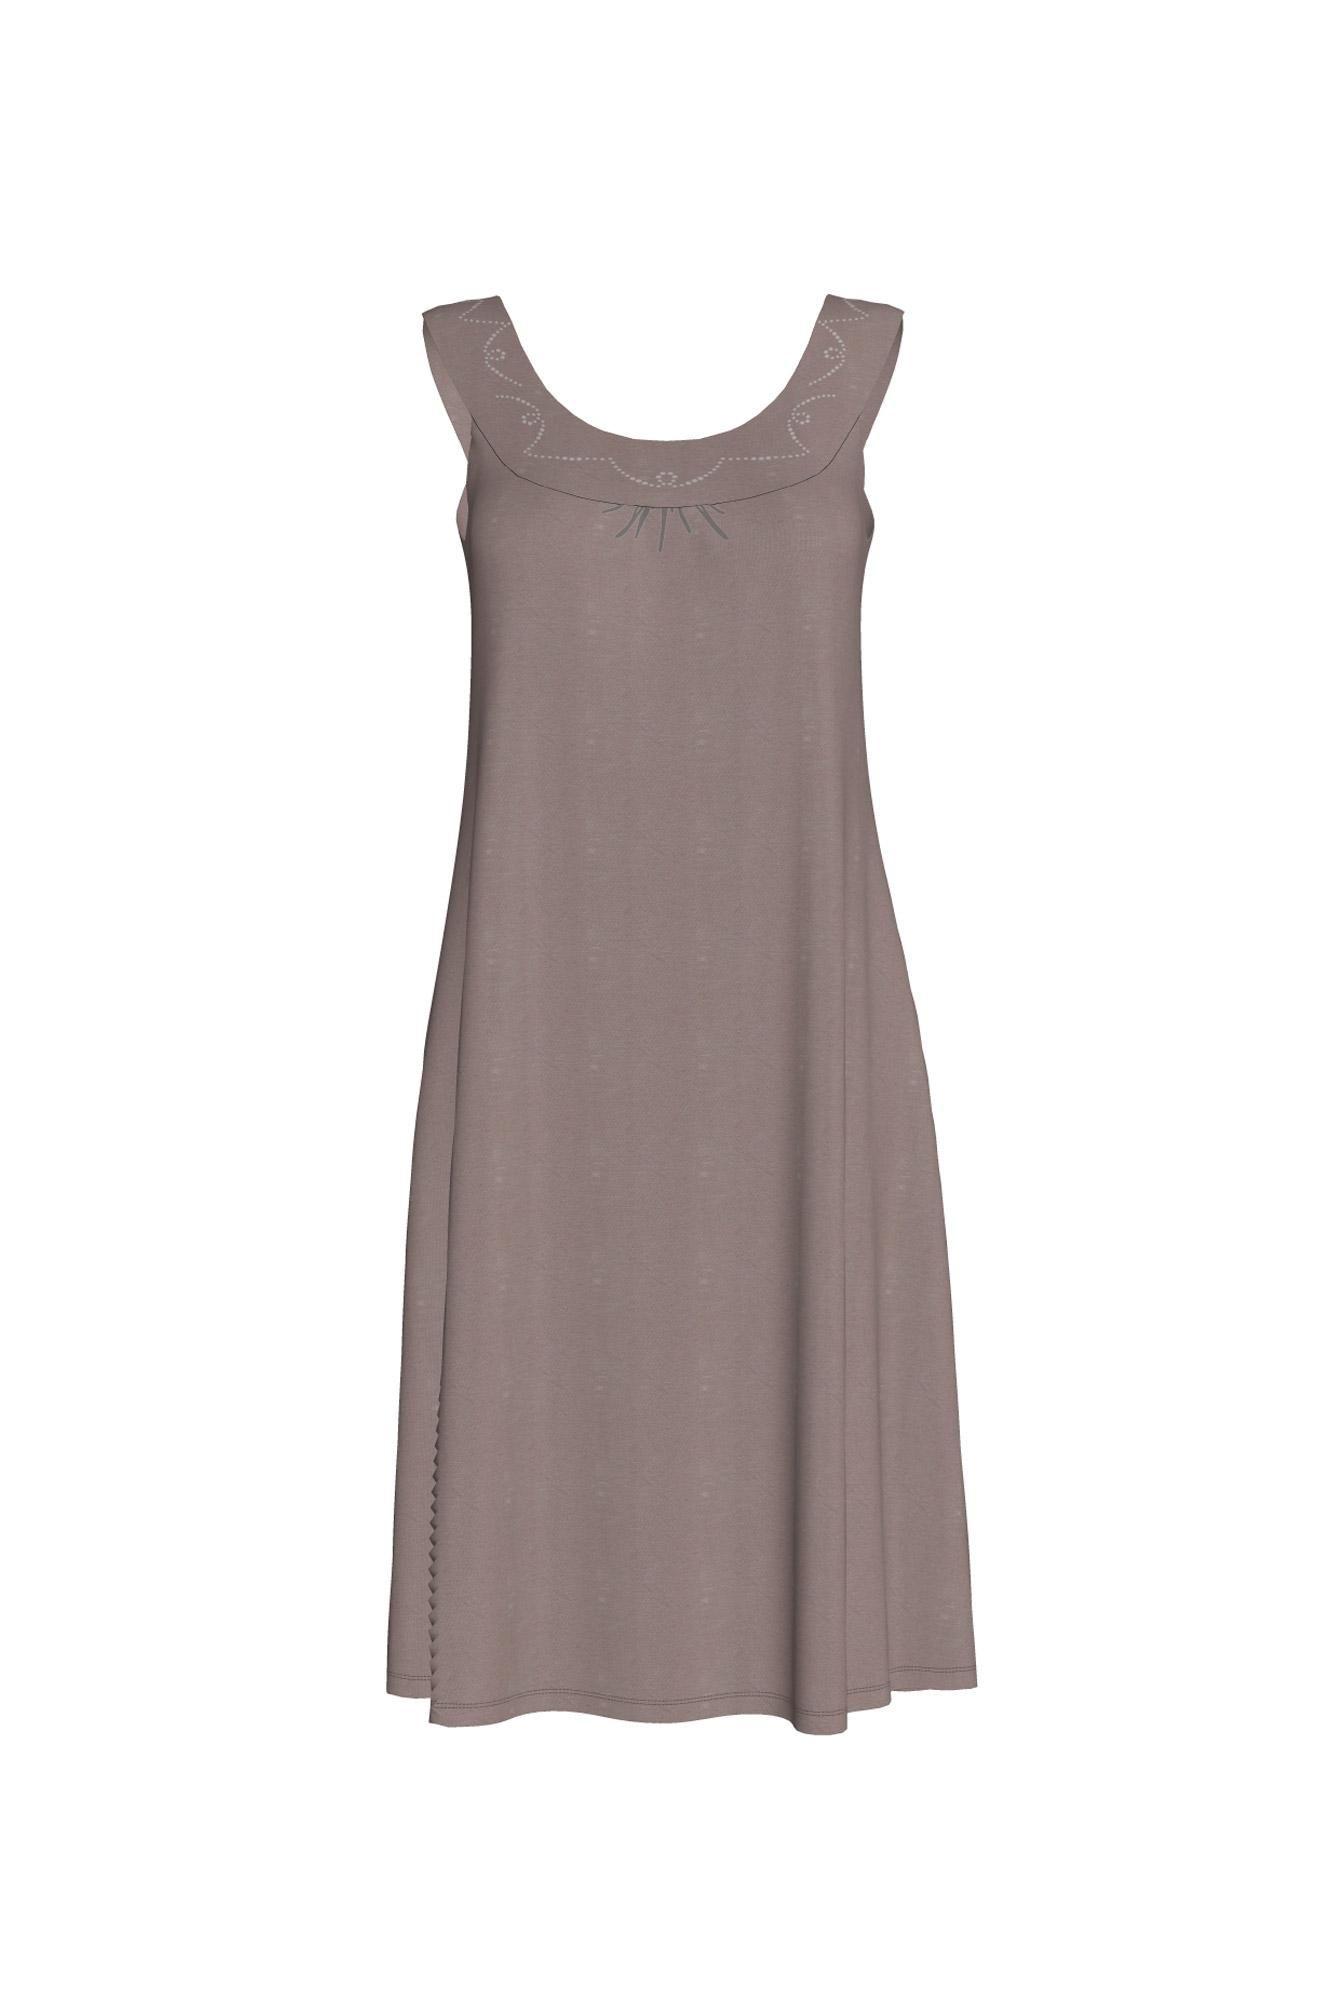 Sleeveless Beach Dress